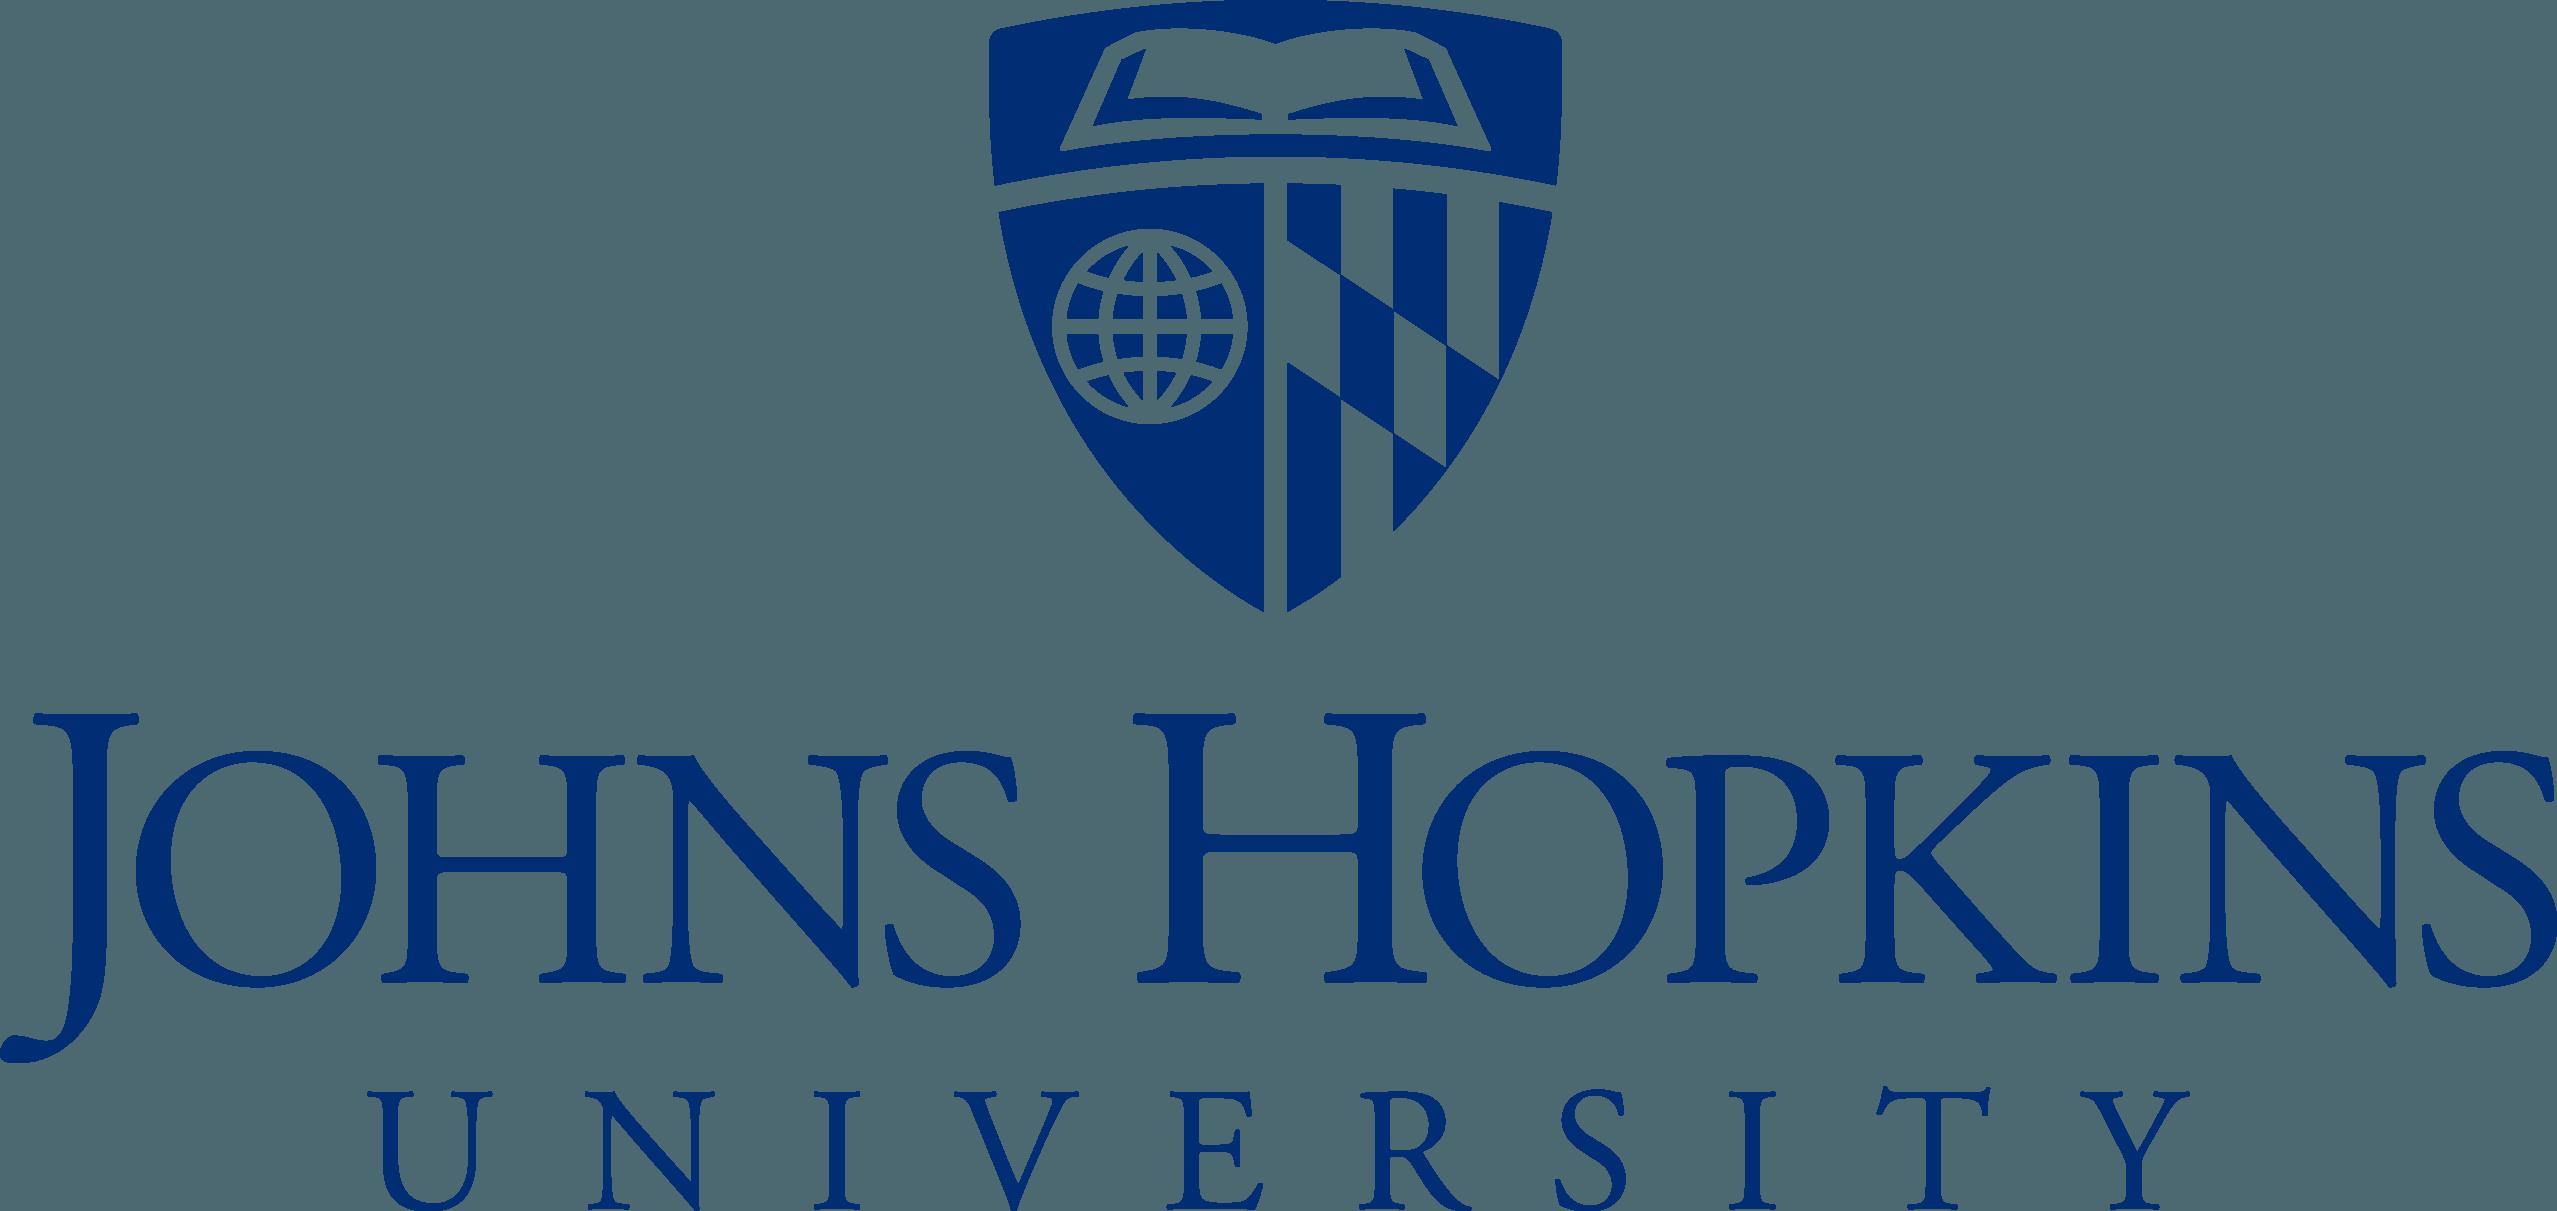 JHU Logo and Seal [Johns Hopkins University] Download Vector.